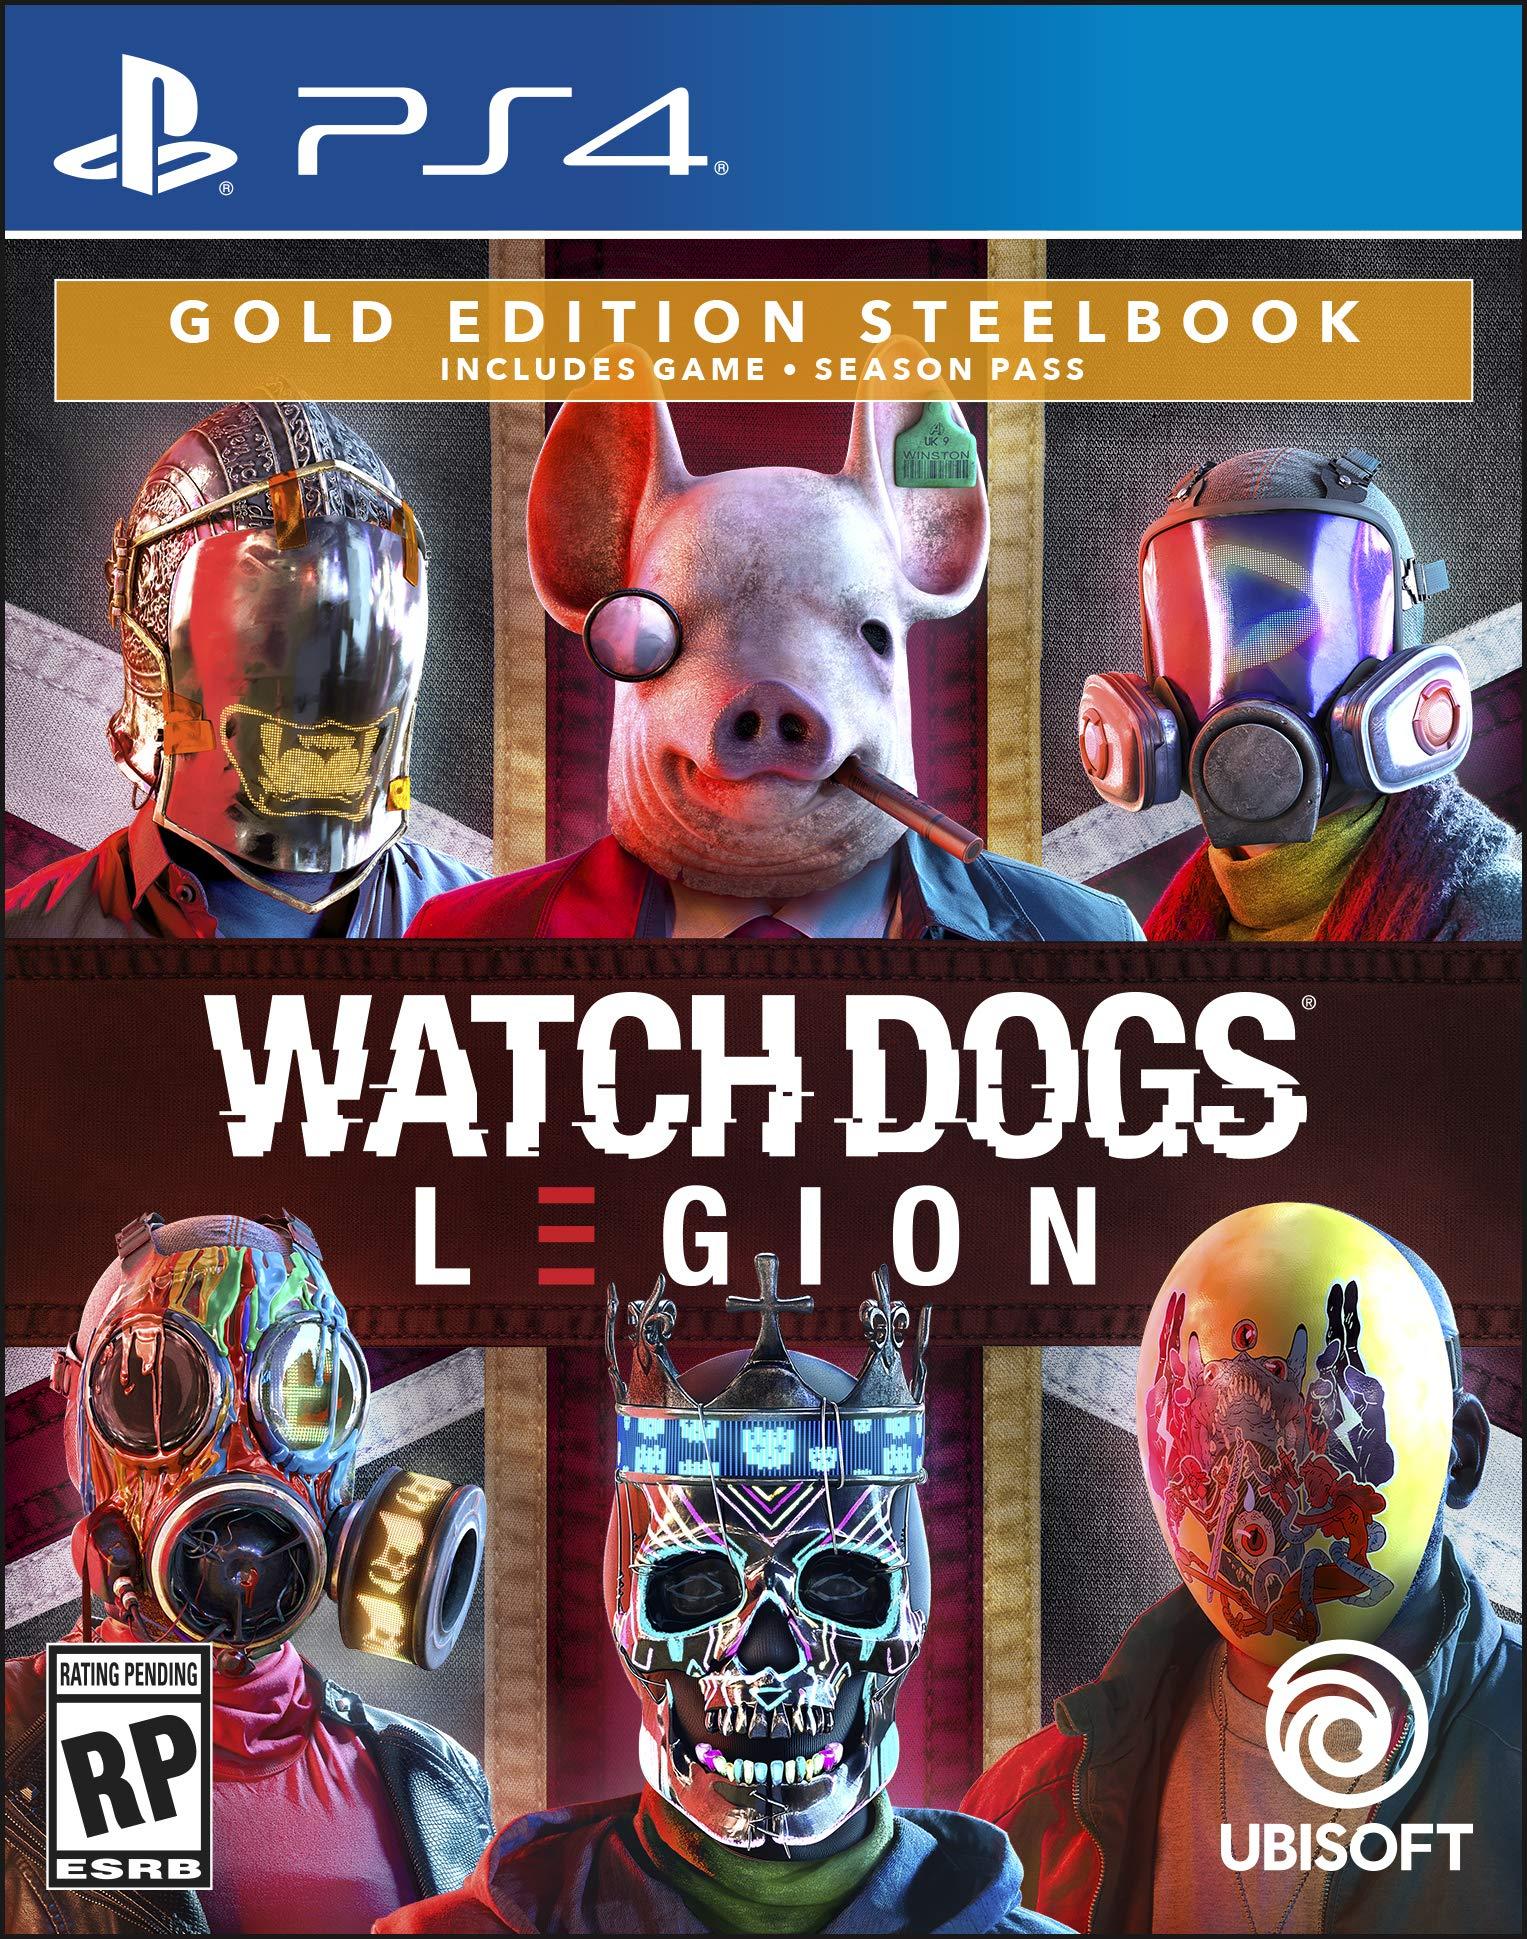 Watch Dogs Legion - PlayStation 4 Gold Steelbook Edition